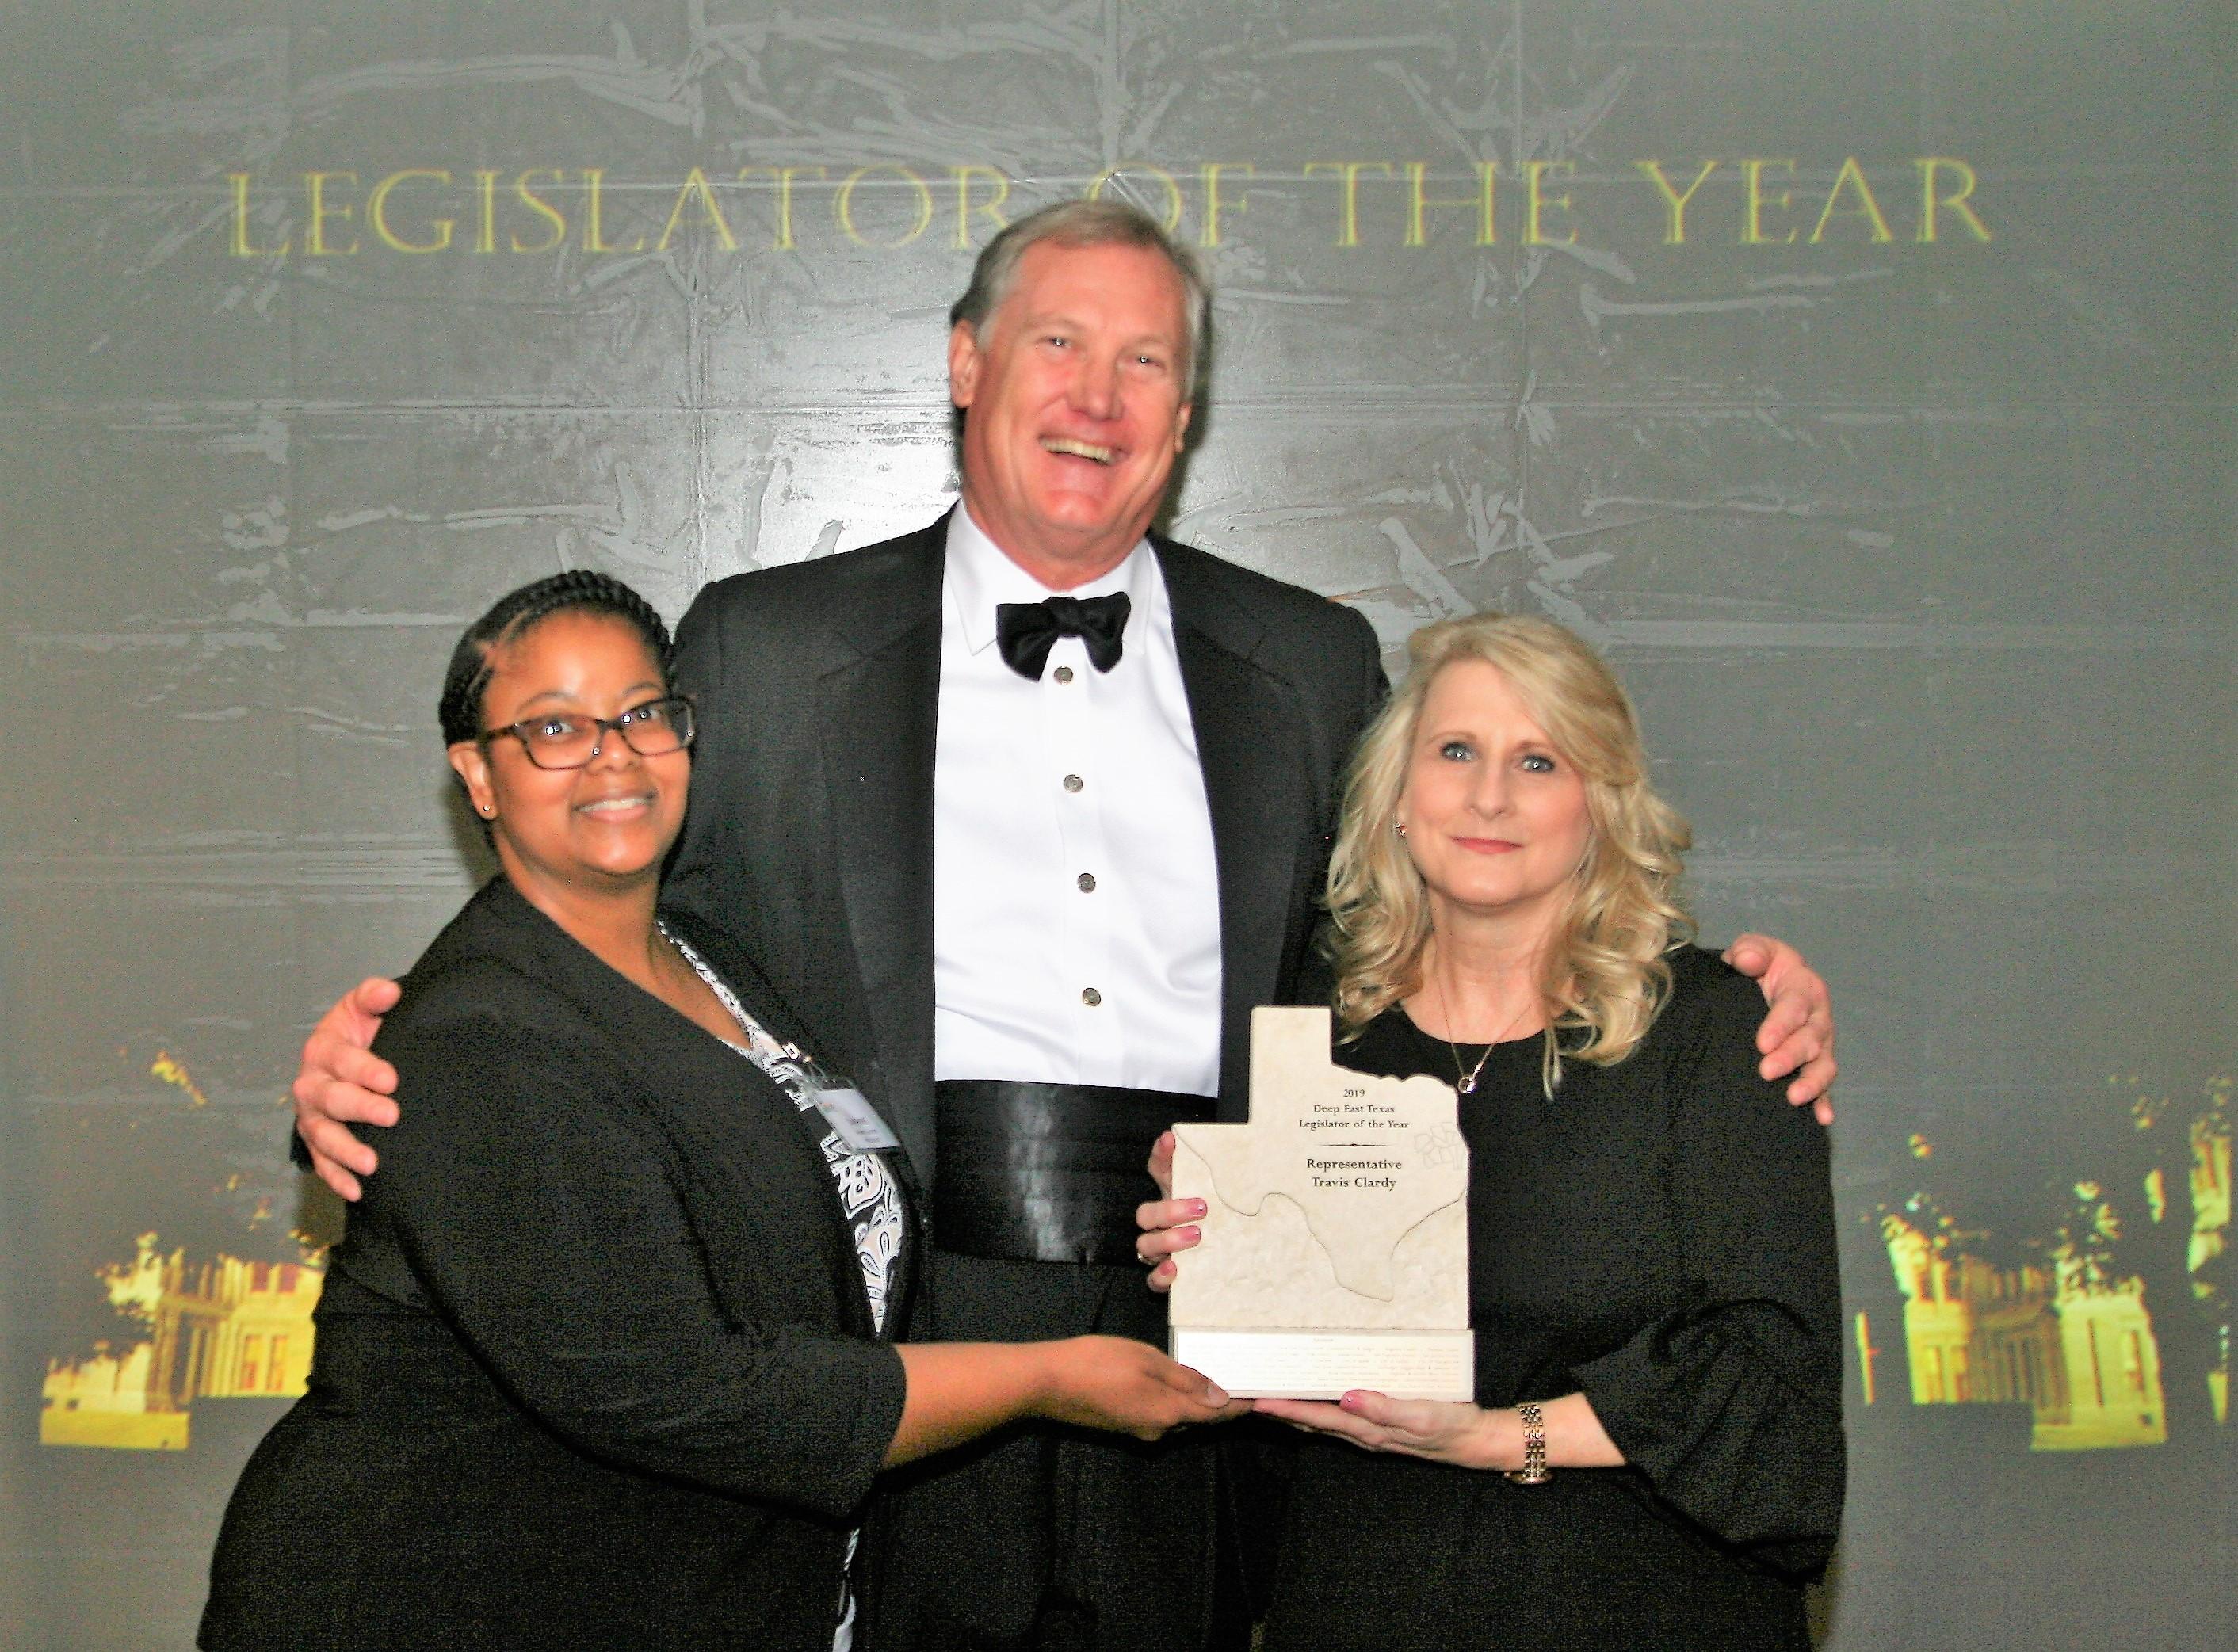 State Representative Travis Clardy Honored as Legislator of the Year at Deep East Texas Reception